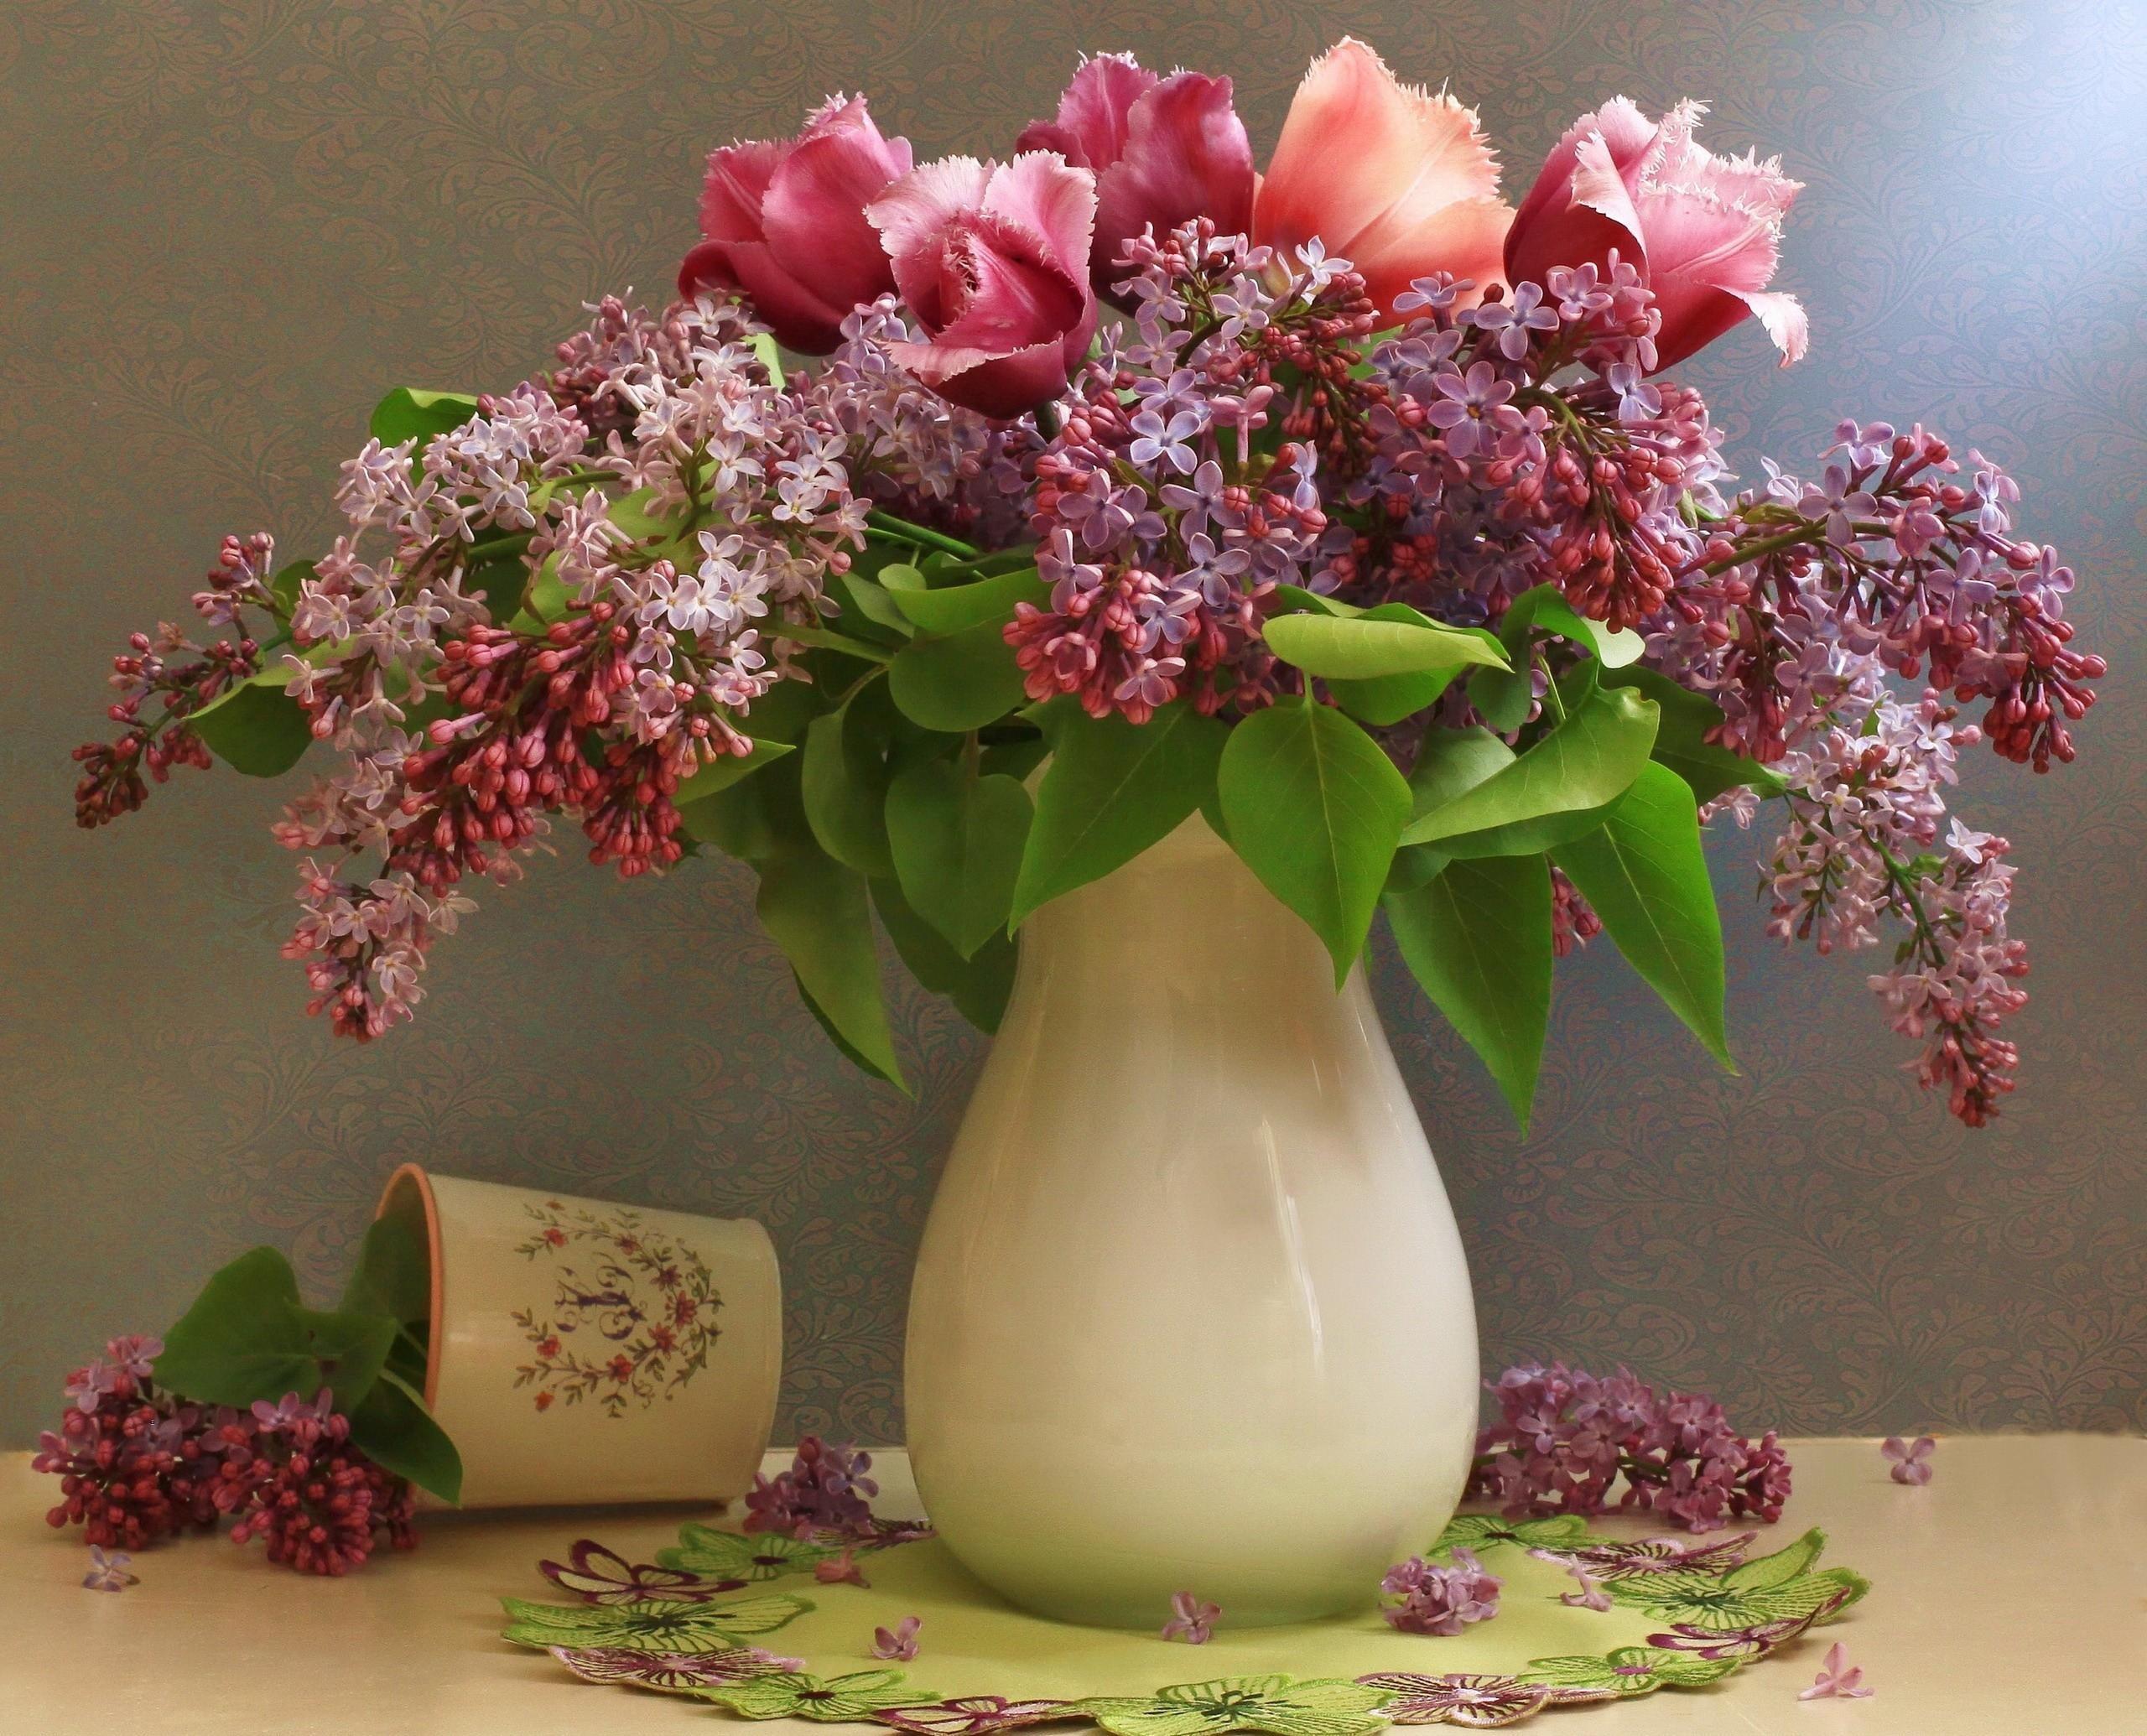 Hintergrundbilder : Flieder, Tulpen, Blume, Frühling, Vase